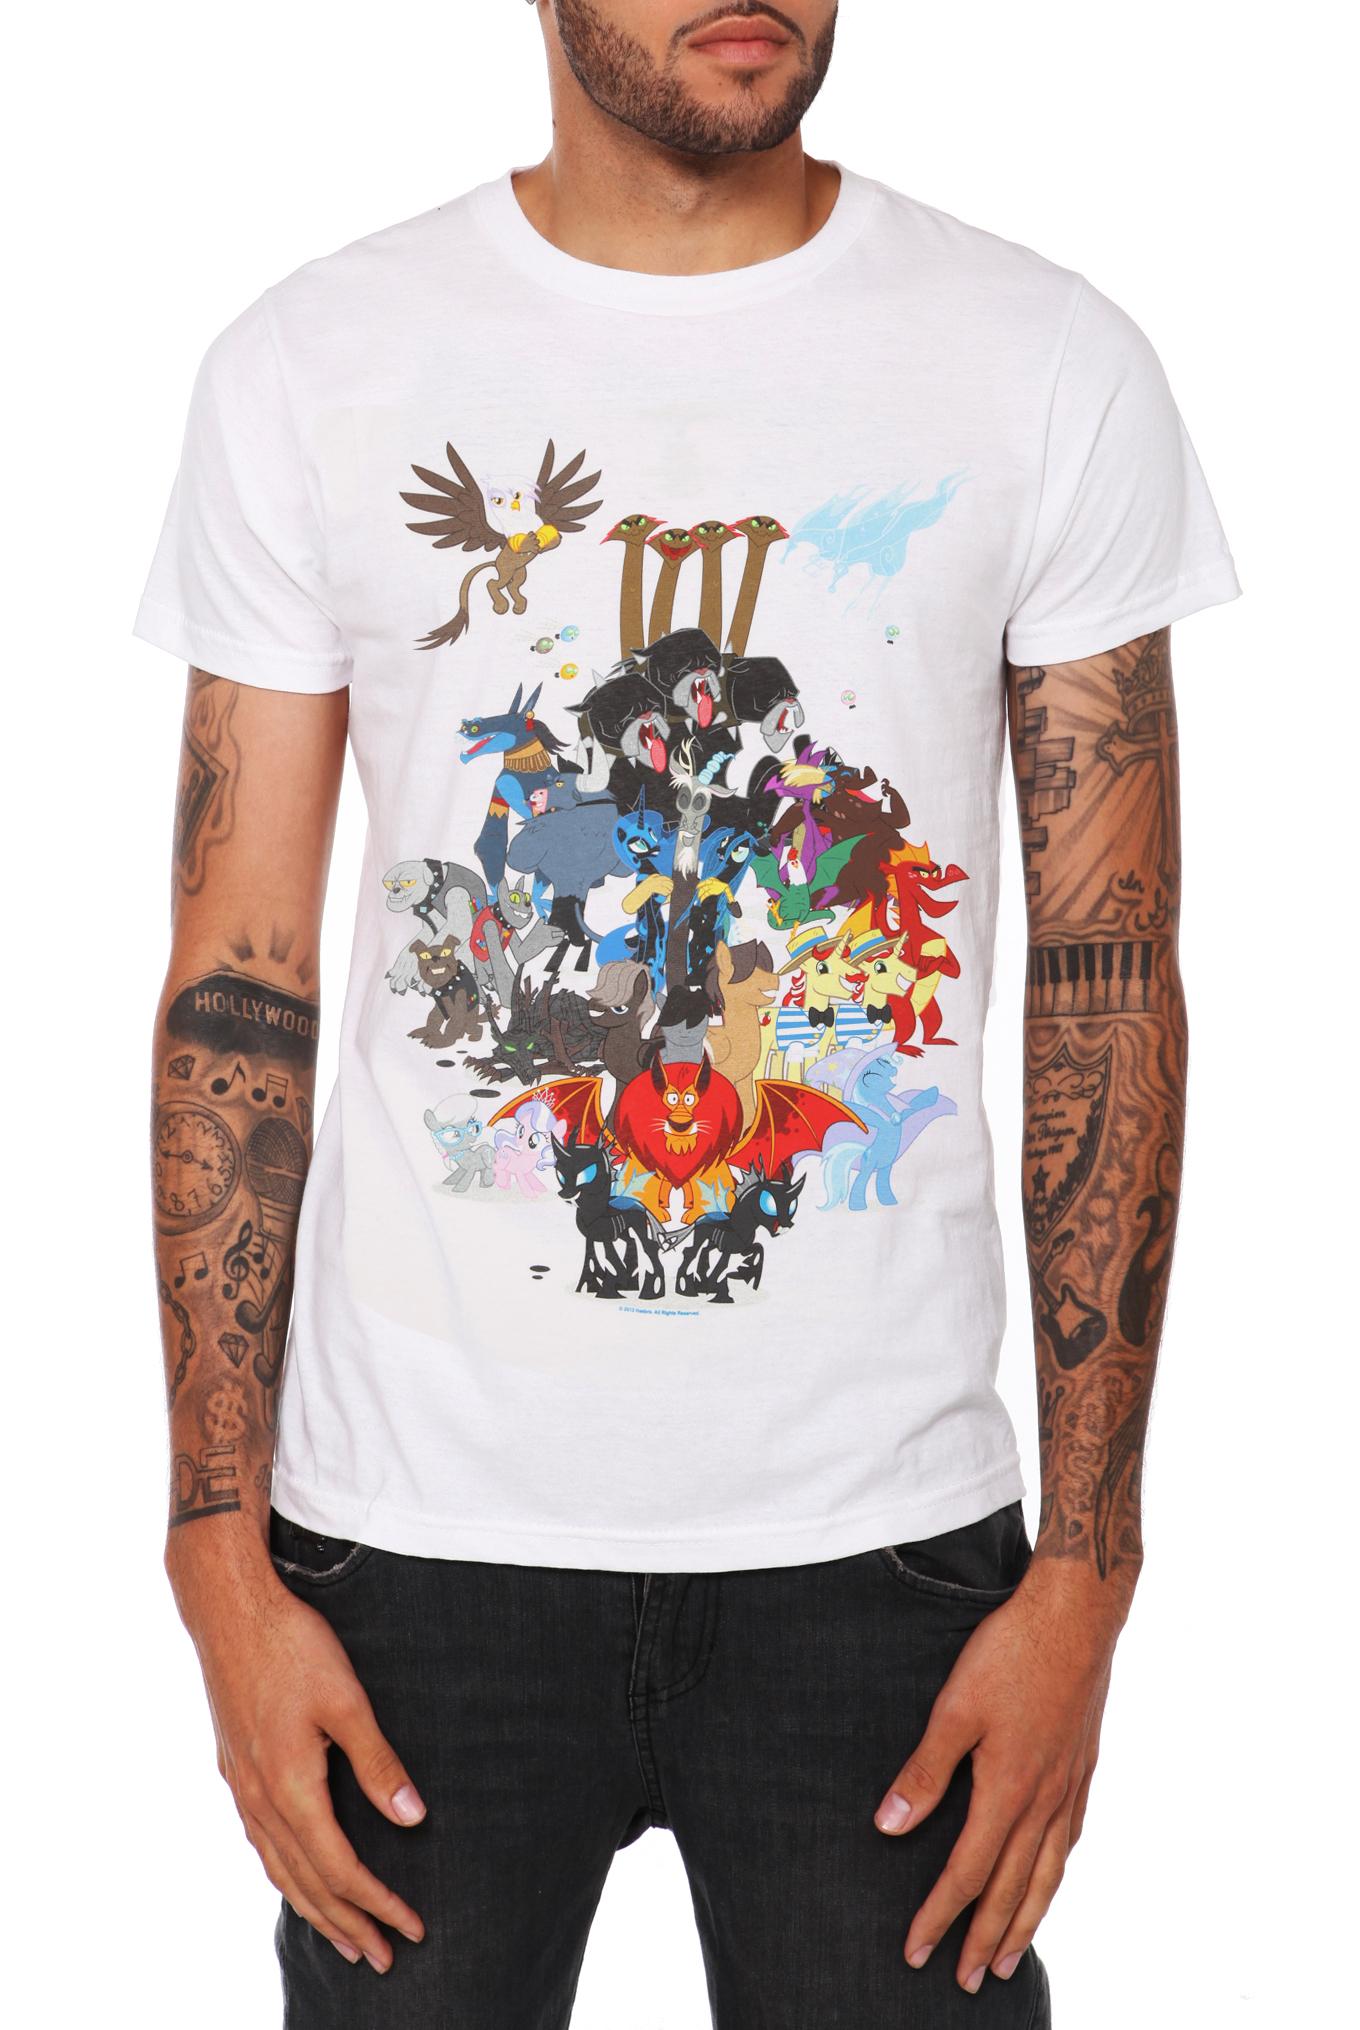 Image - My Little Pony Villains T-Shirt Hot Topic.jpg | My ...